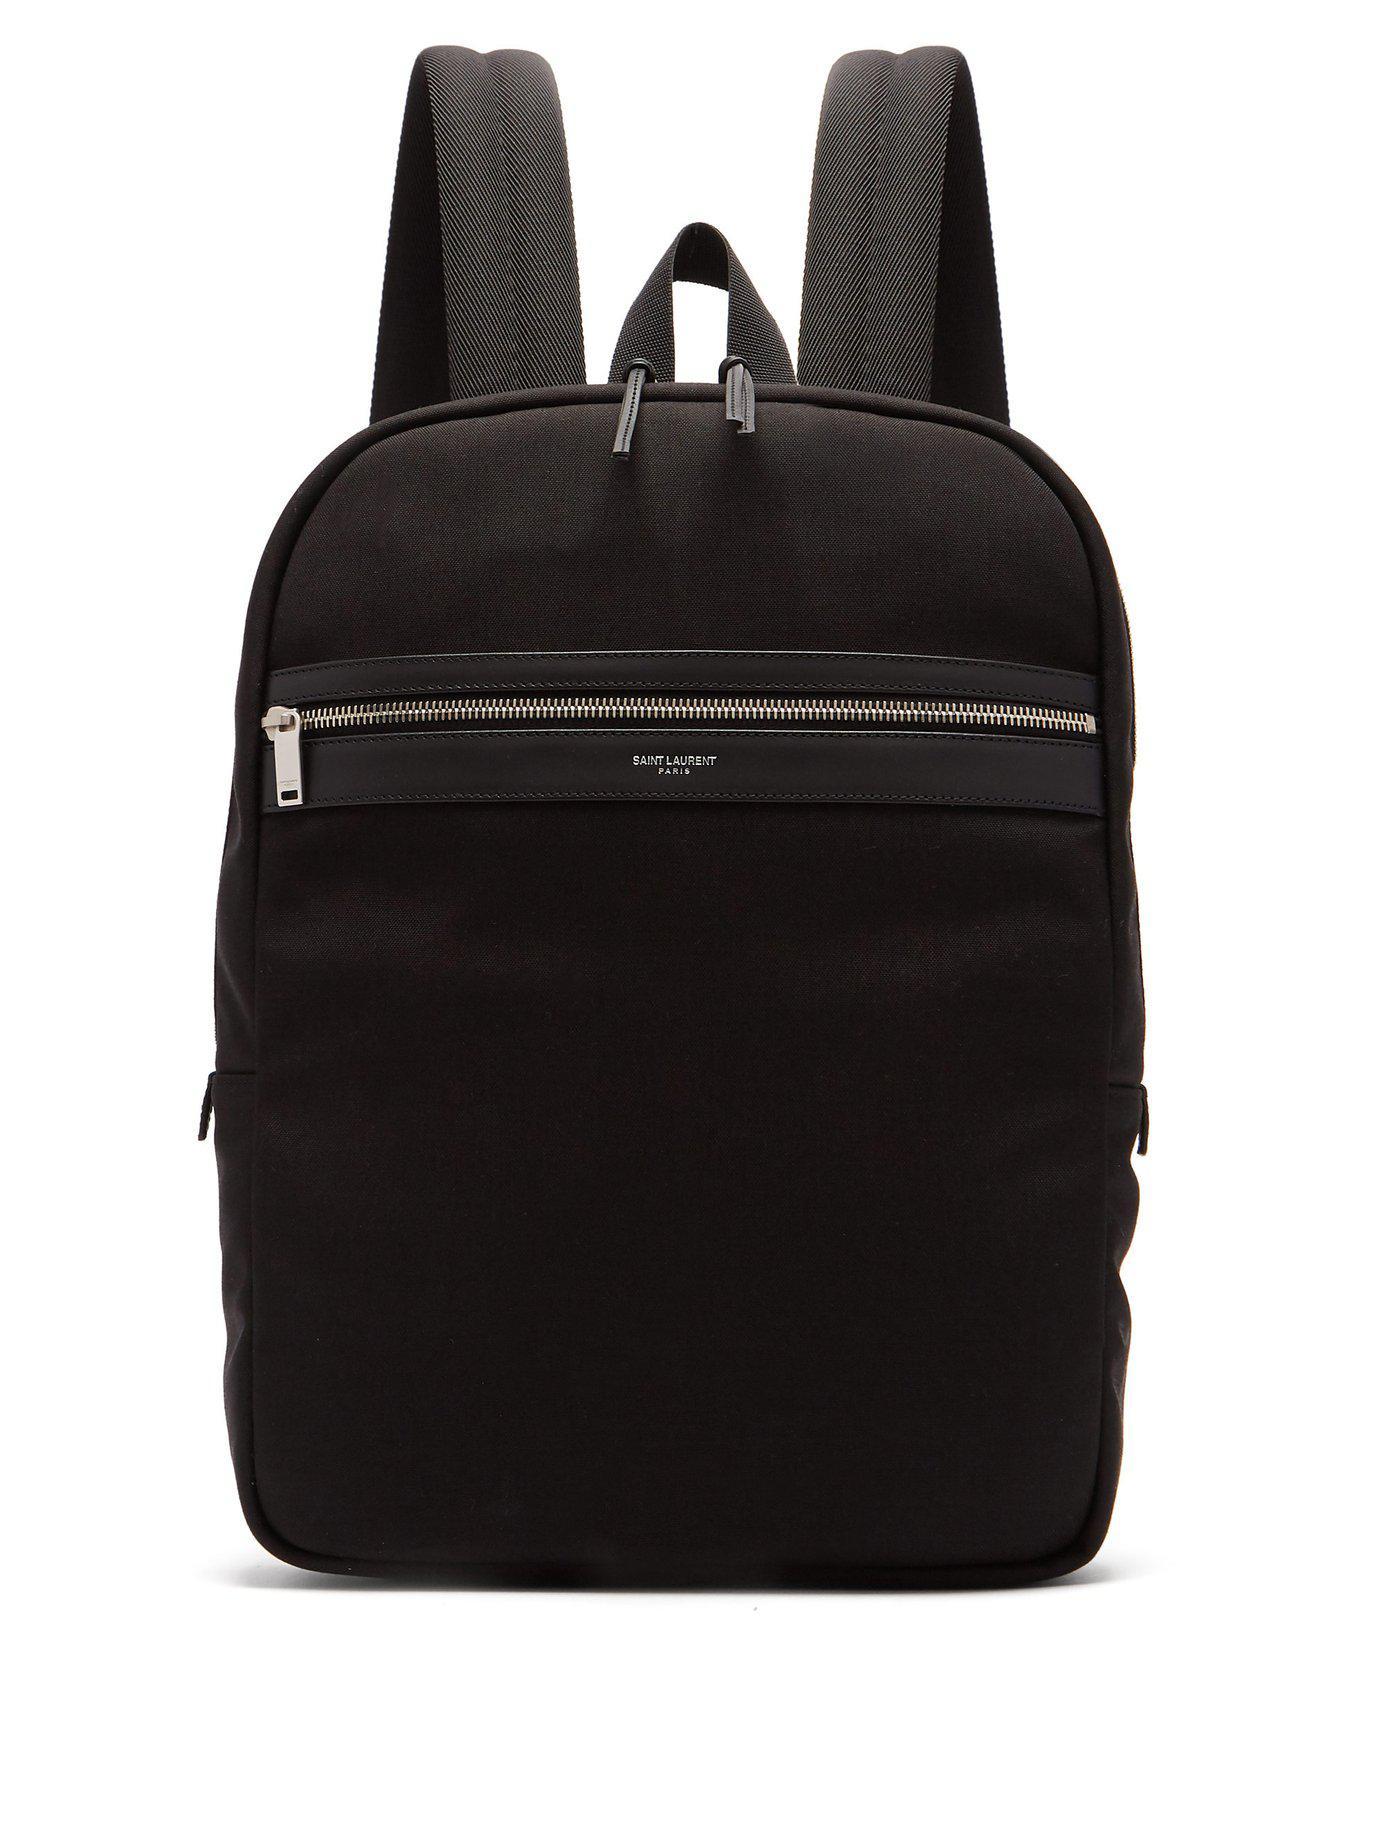 abd6fa9b5a2f ... Black City Canvas Backpack for Men - Lyst. View fullscreen